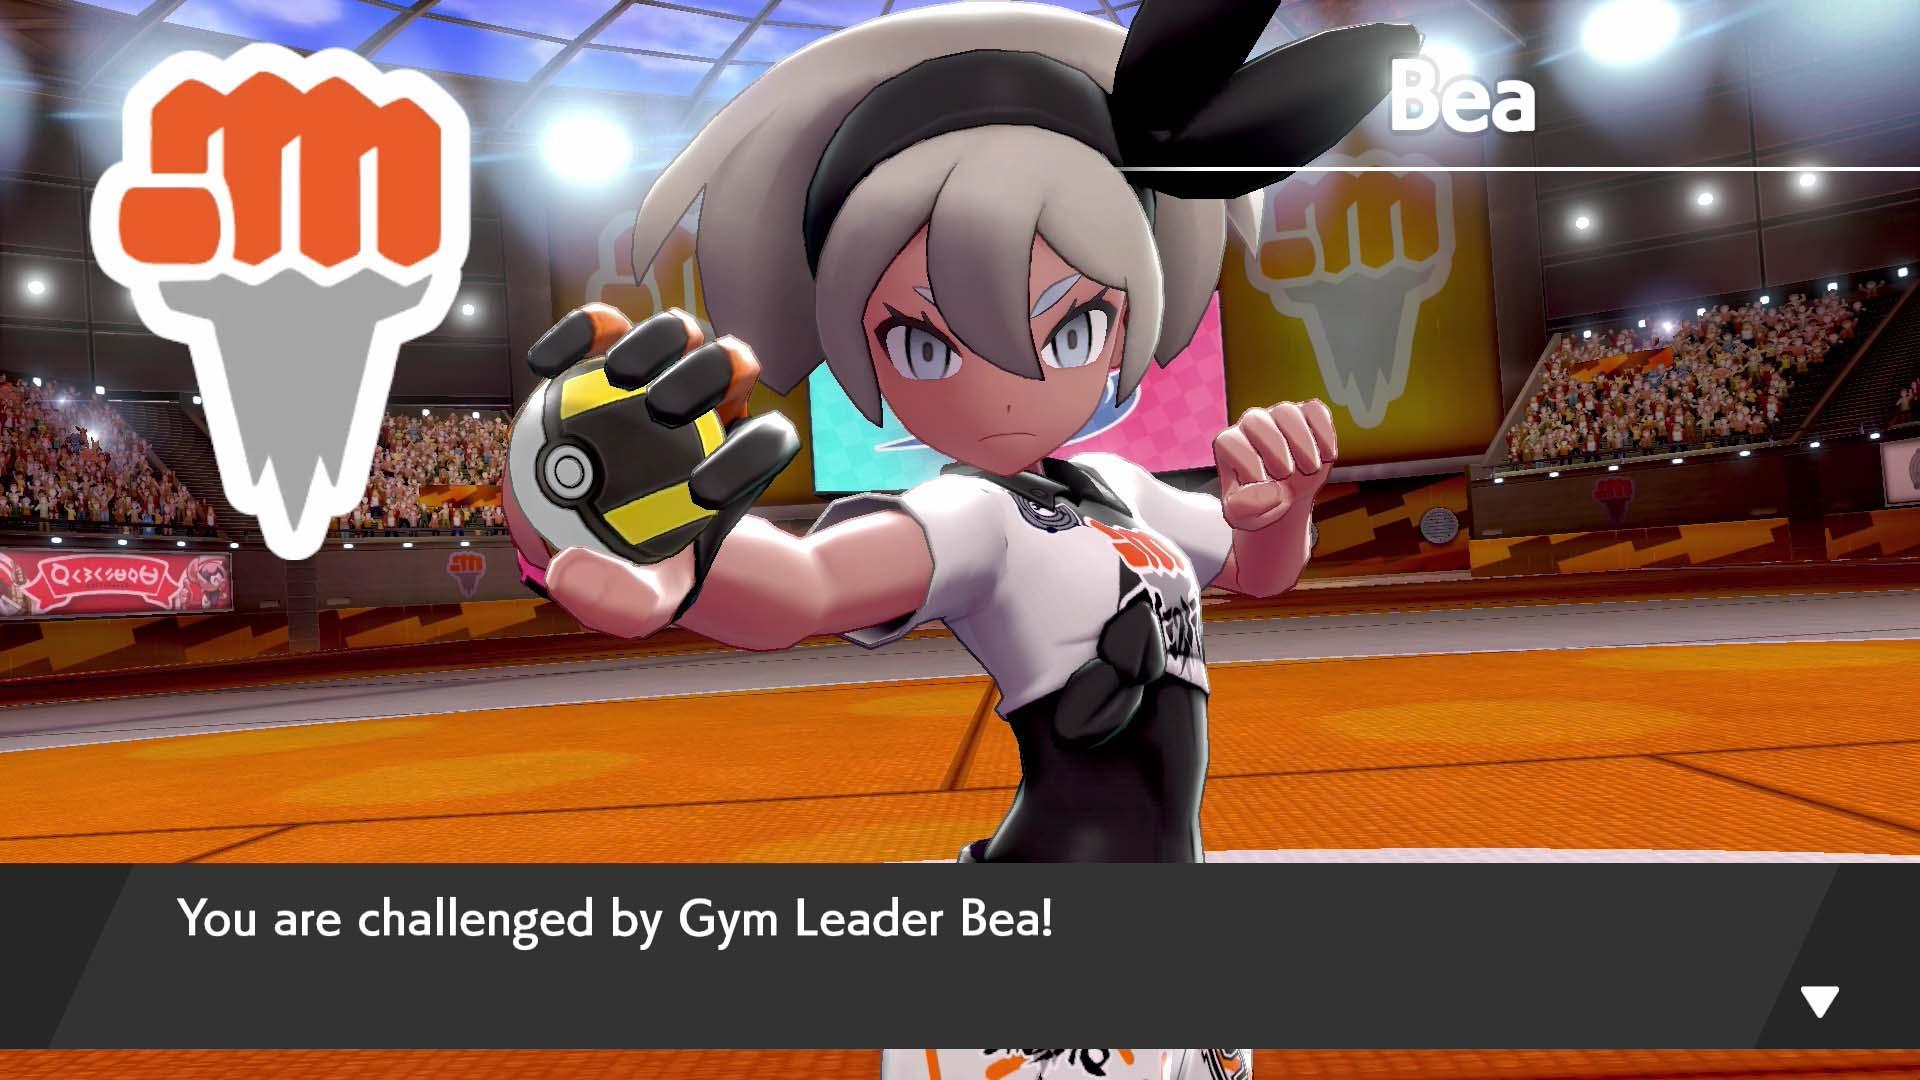 New Pokemon Sword and Shield Details - Gigantamaxing, New